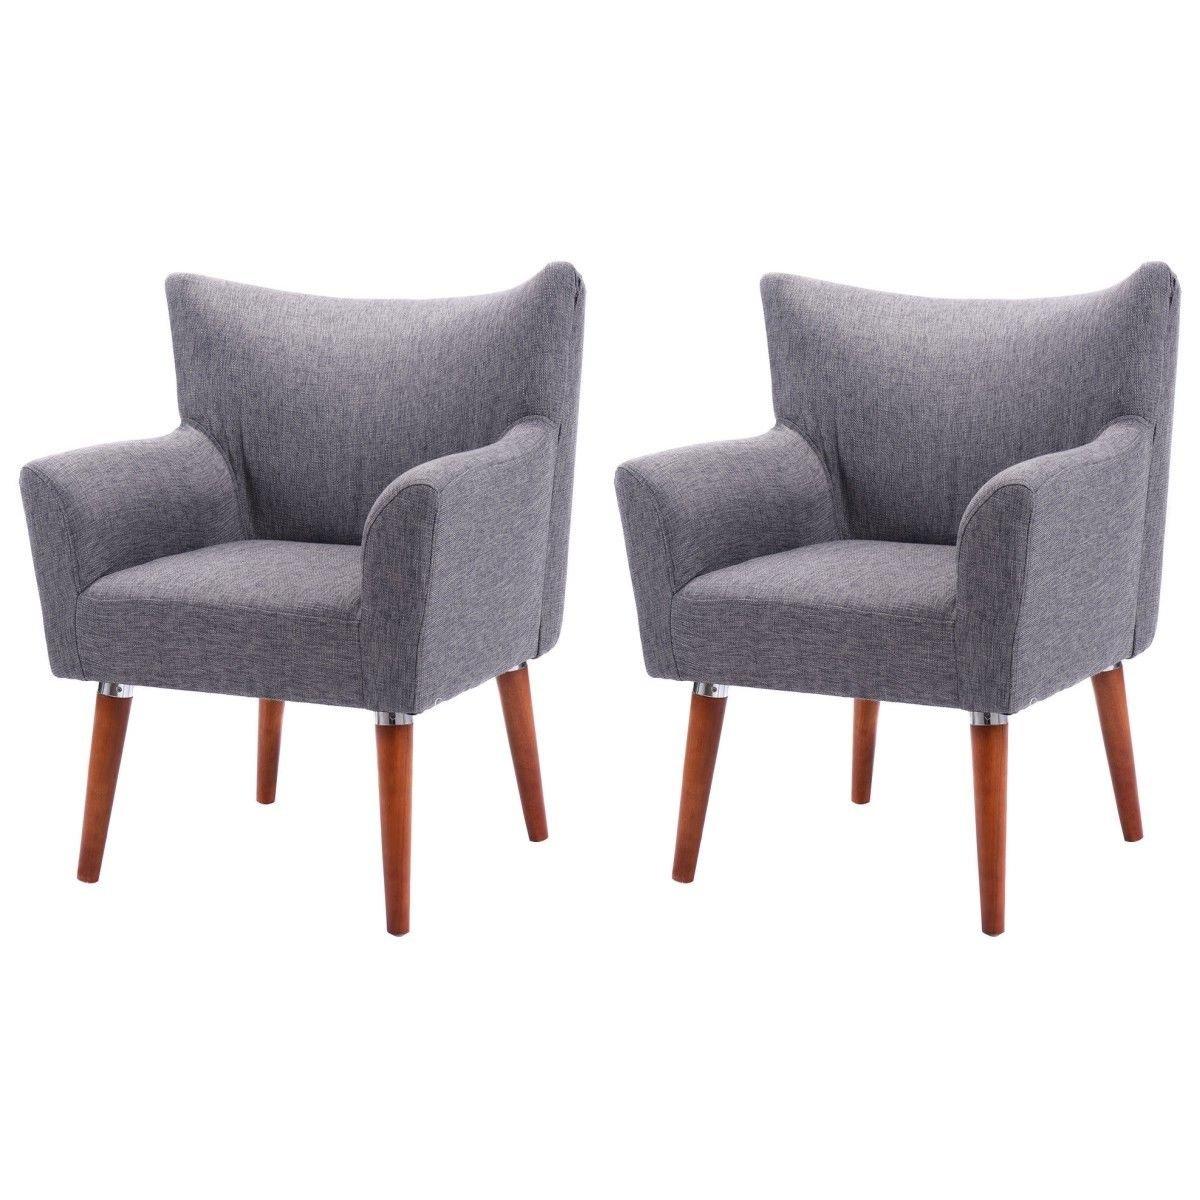 Amazon.com: Giantex Set Of 2 Leisure Arm Chair Single Couch Seat Home  Garden Living Room Furni Sofa (2Grey): Kitchen U0026 Dining